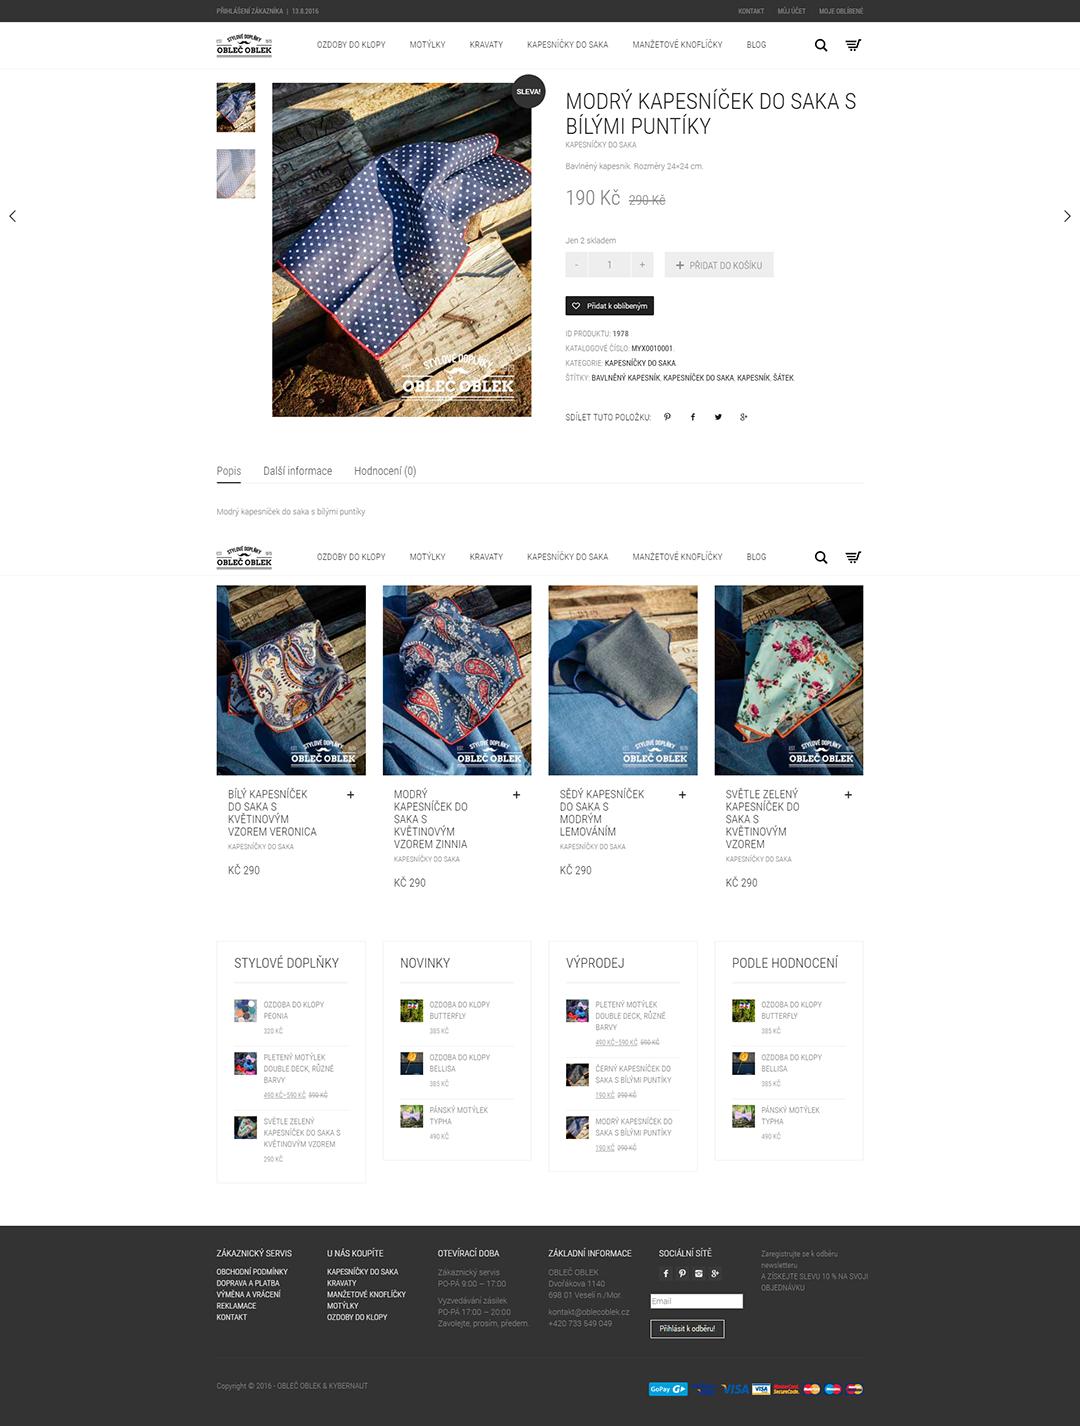 oblecoblek-cz_detail_produktu